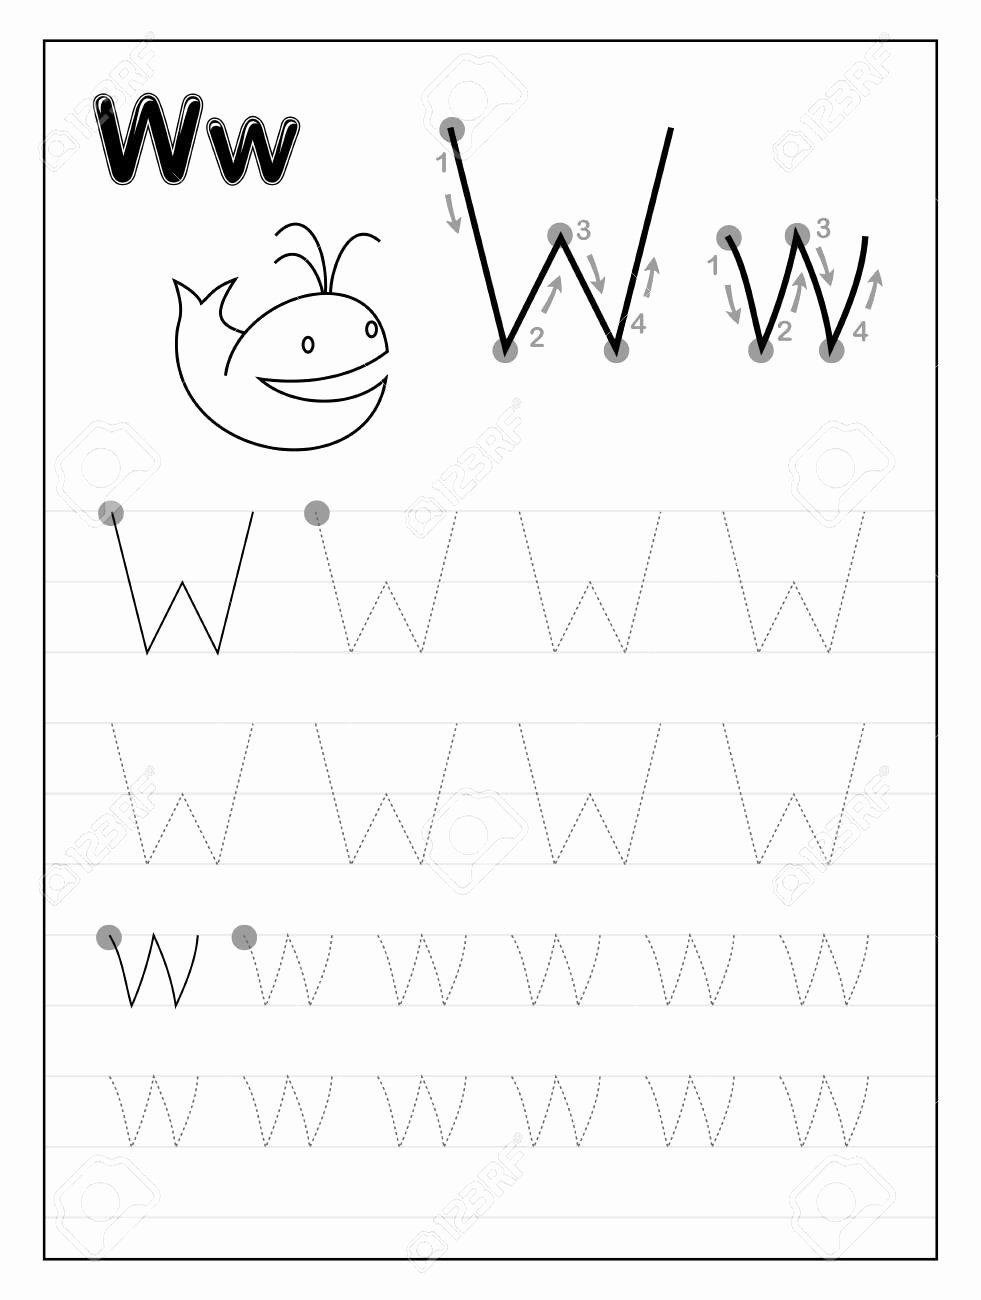 Letter W Worksheets for Preschoolers Unique Stock